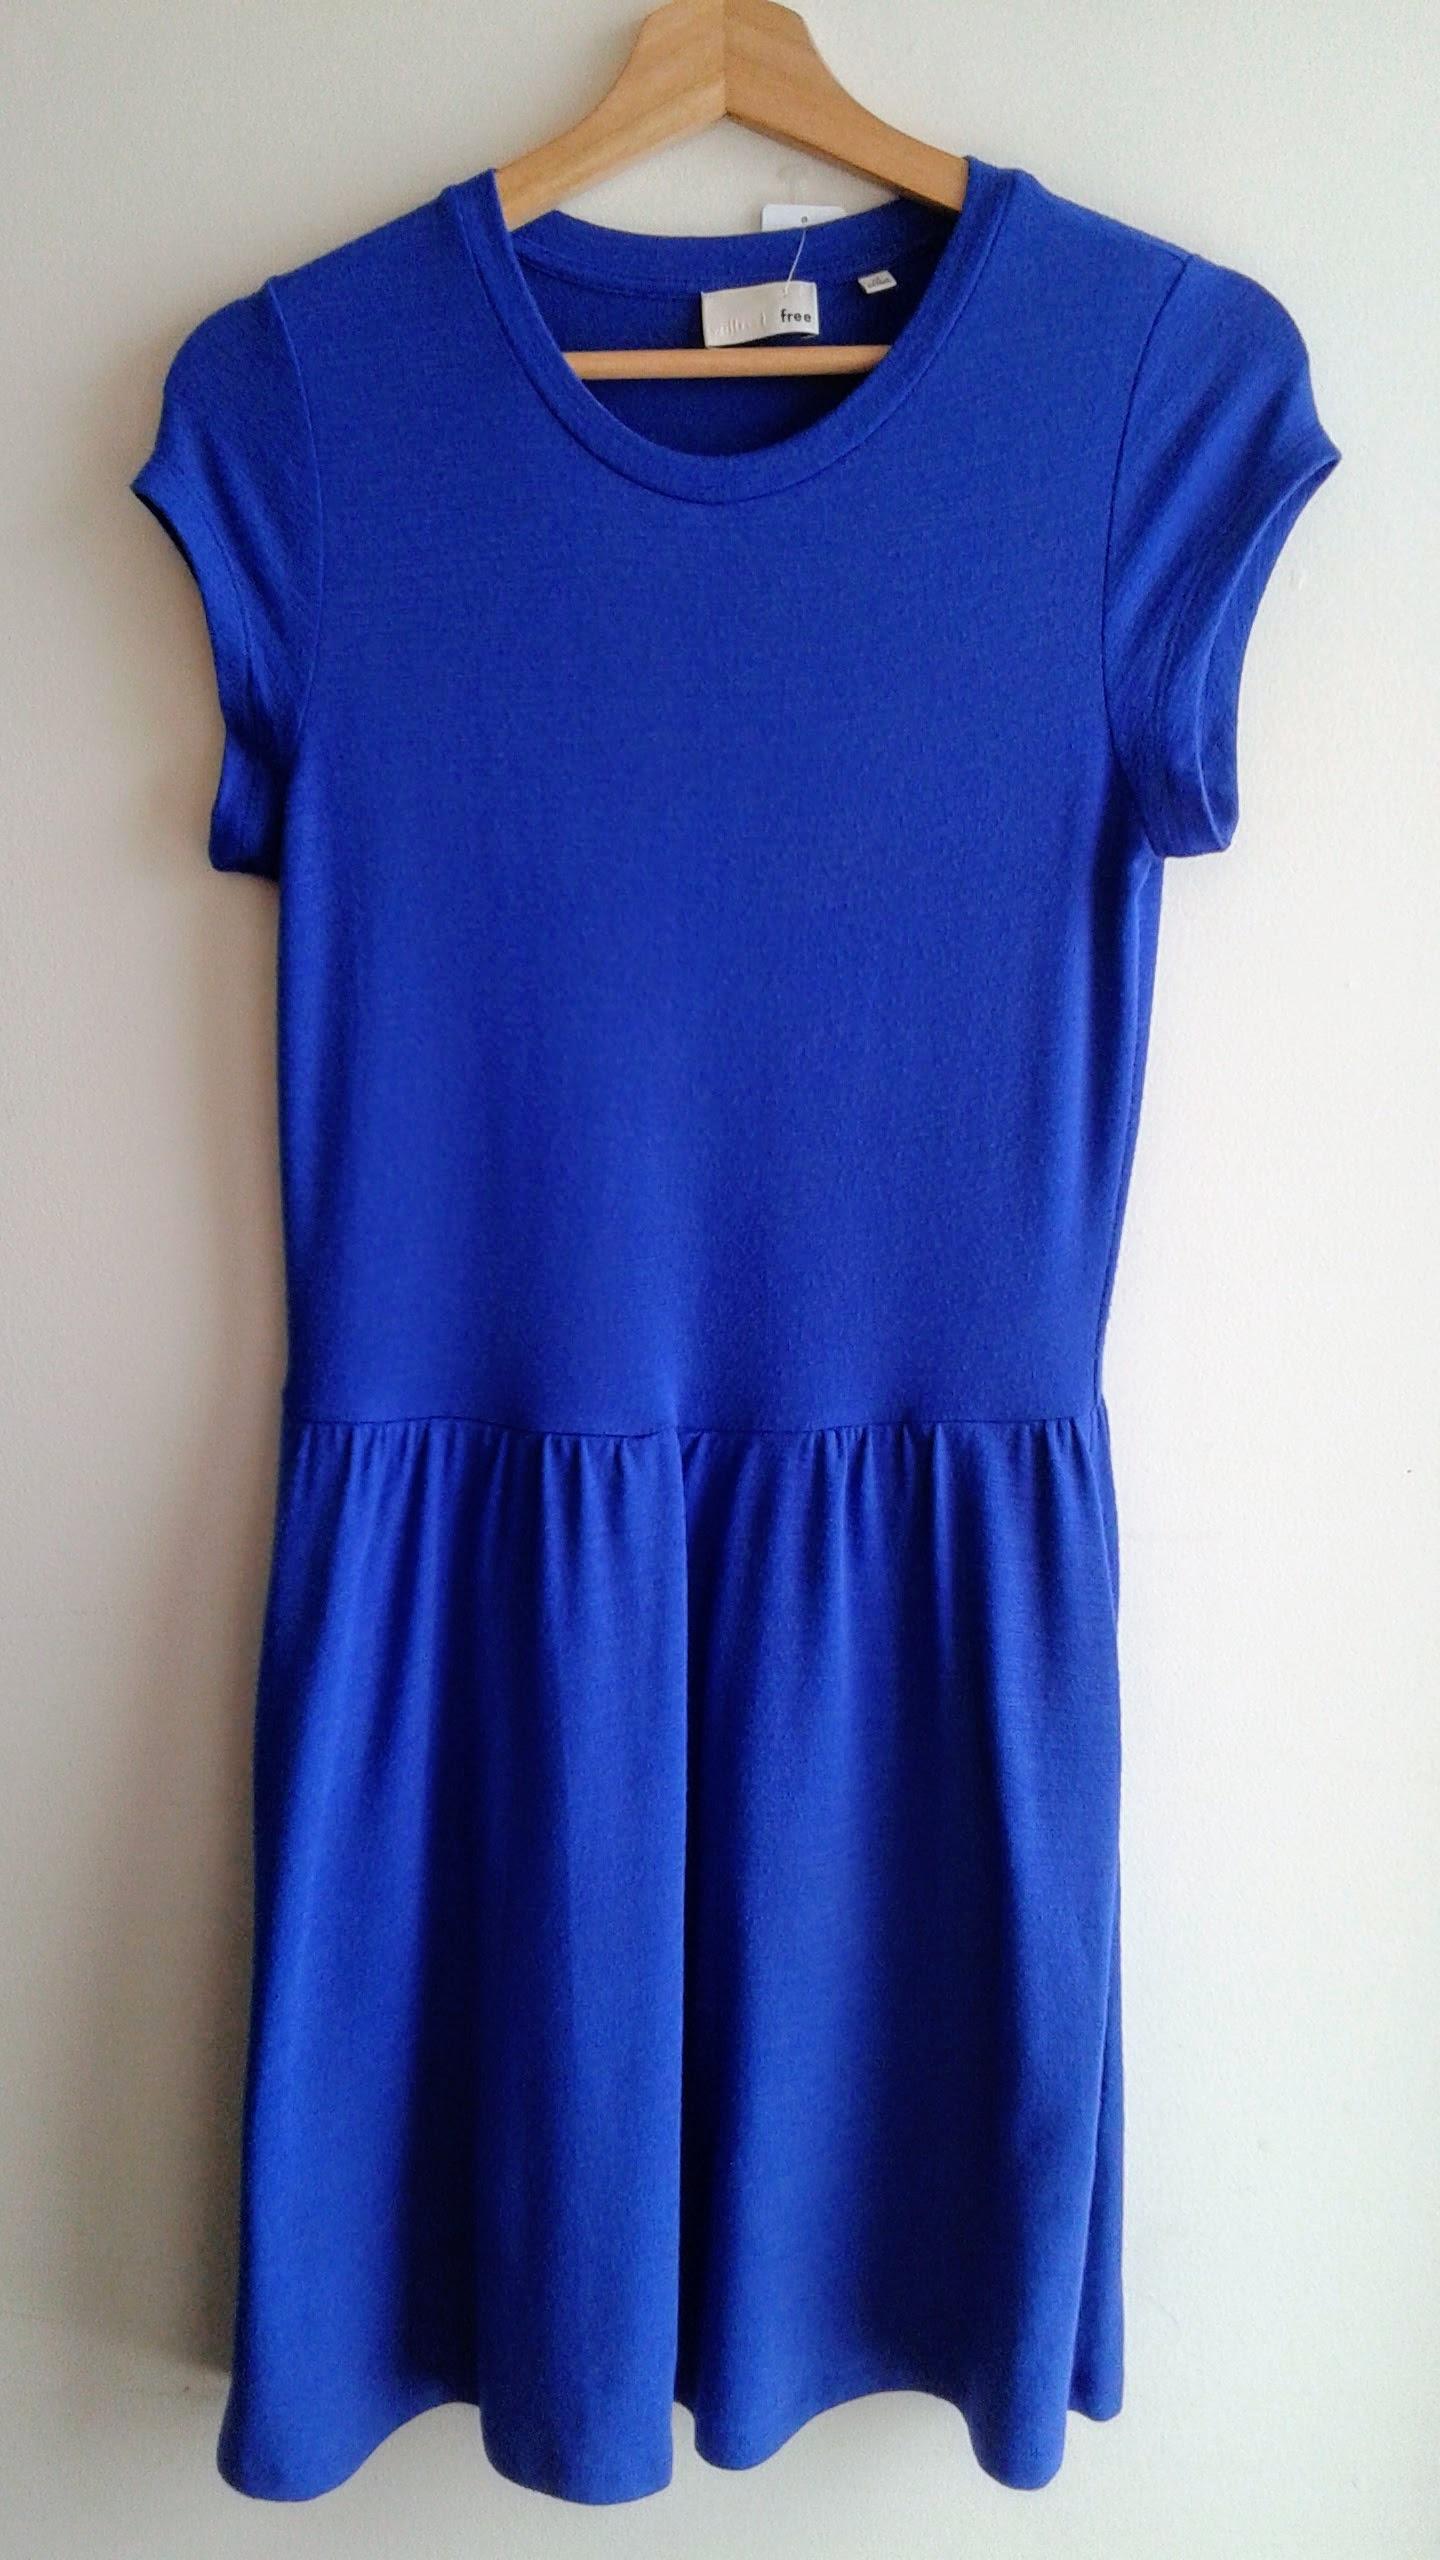 Wilfred Fee dress; Size M, $34